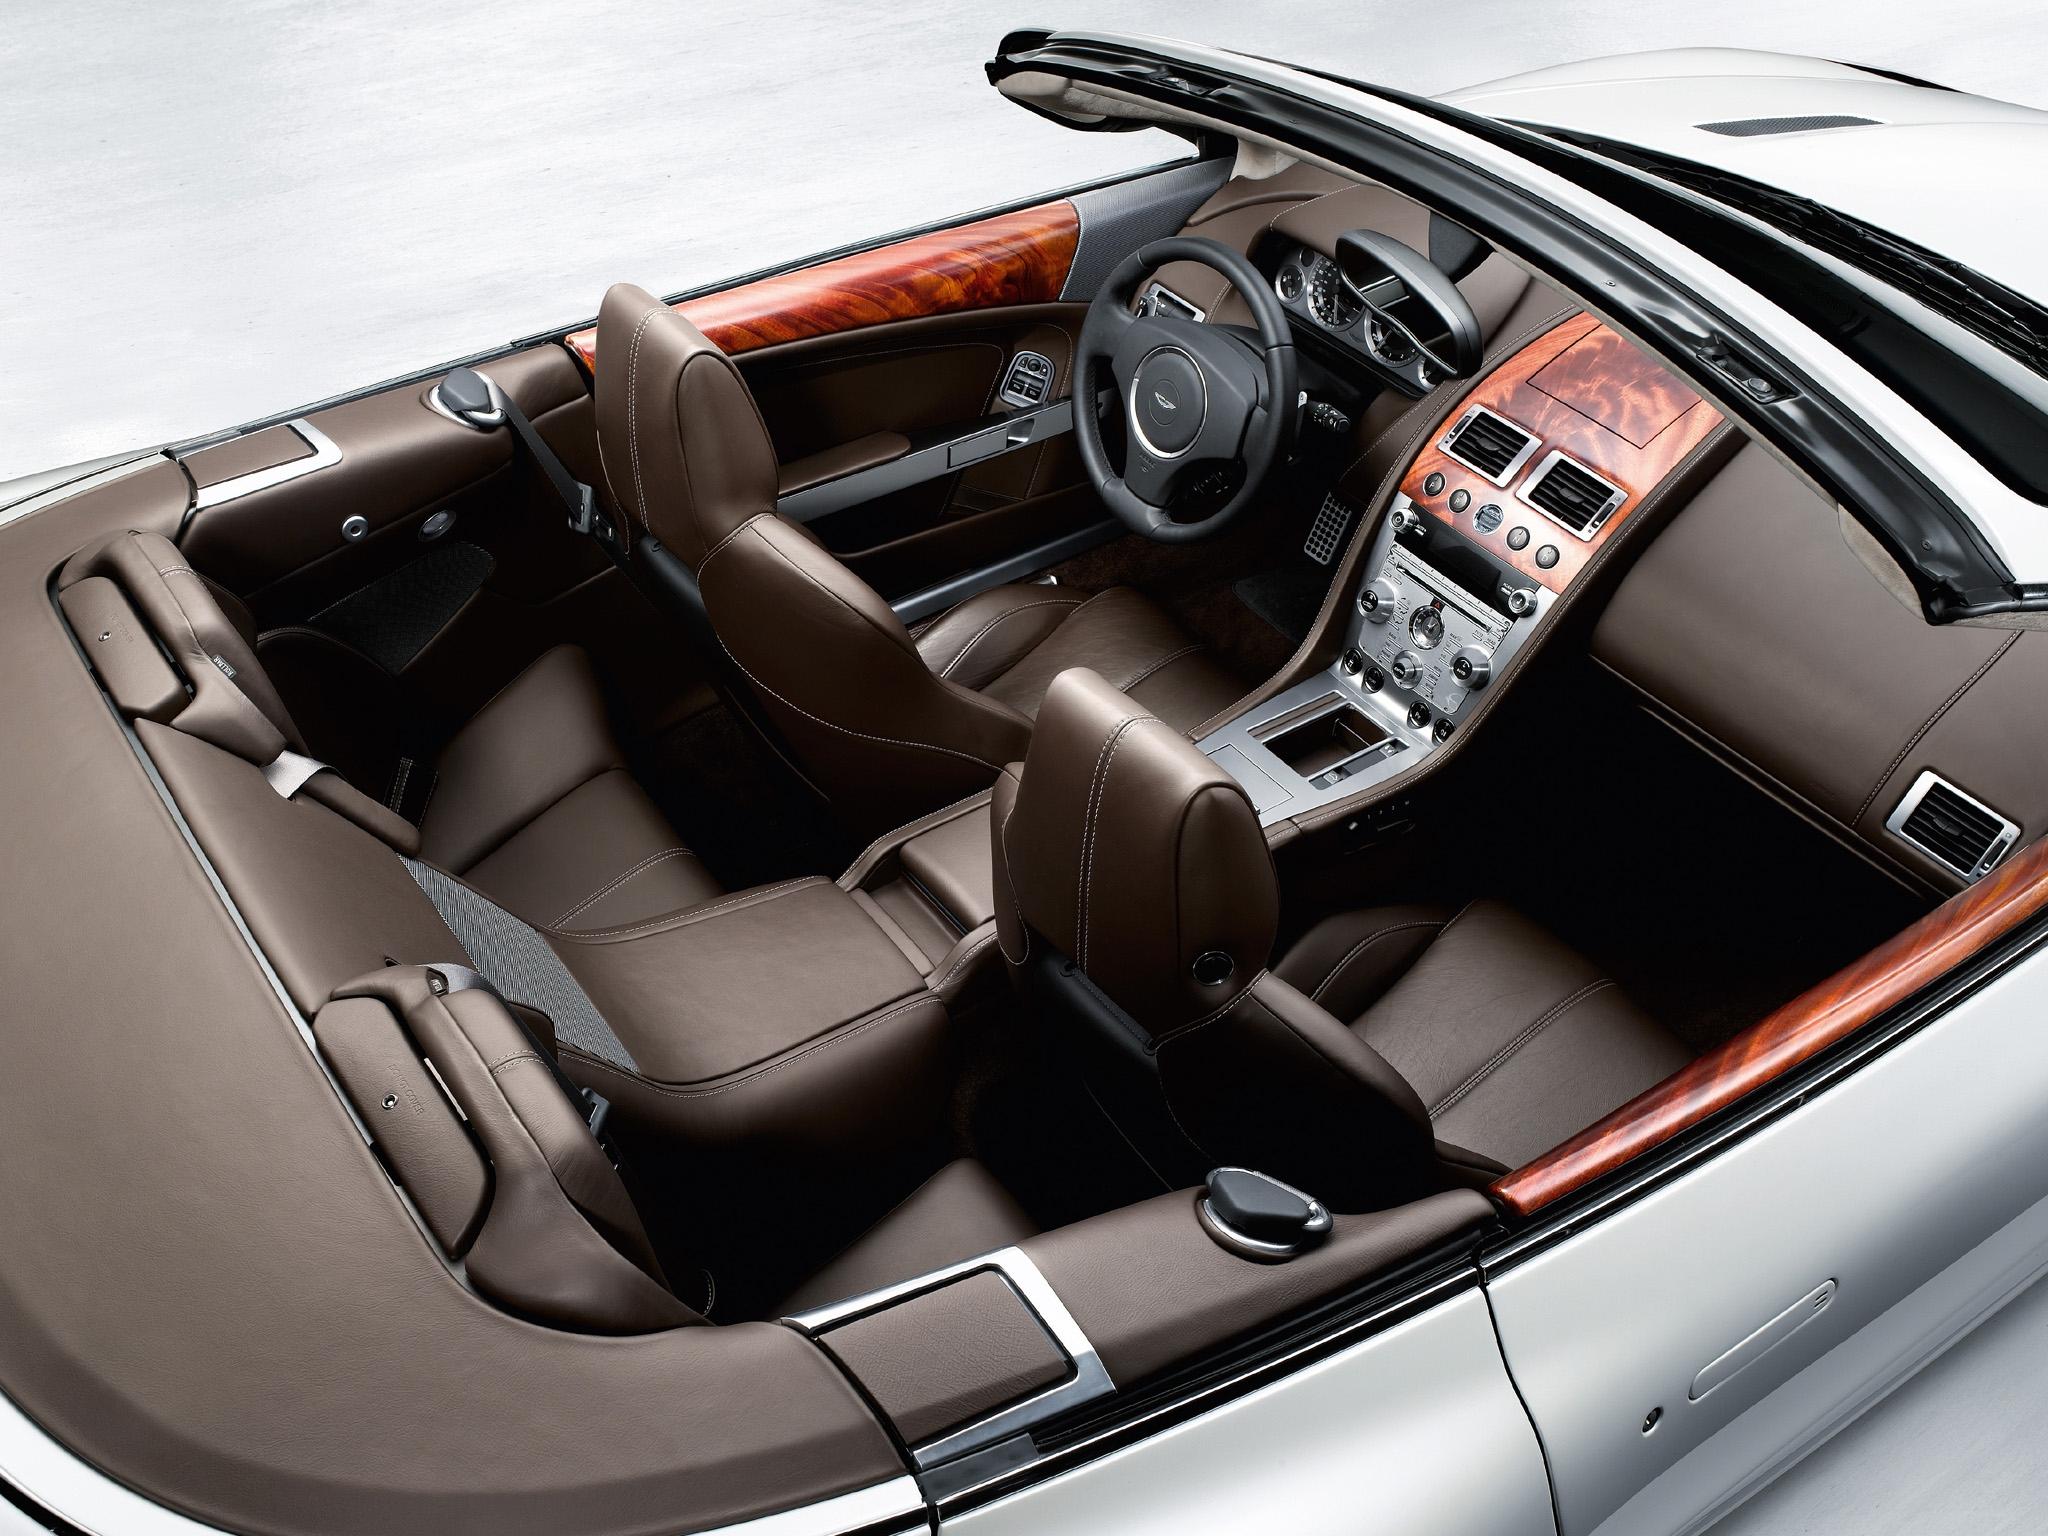 wallpaper interior brown top view honda sports car speedometer aston martin convertible. Black Bedroom Furniture Sets. Home Design Ideas